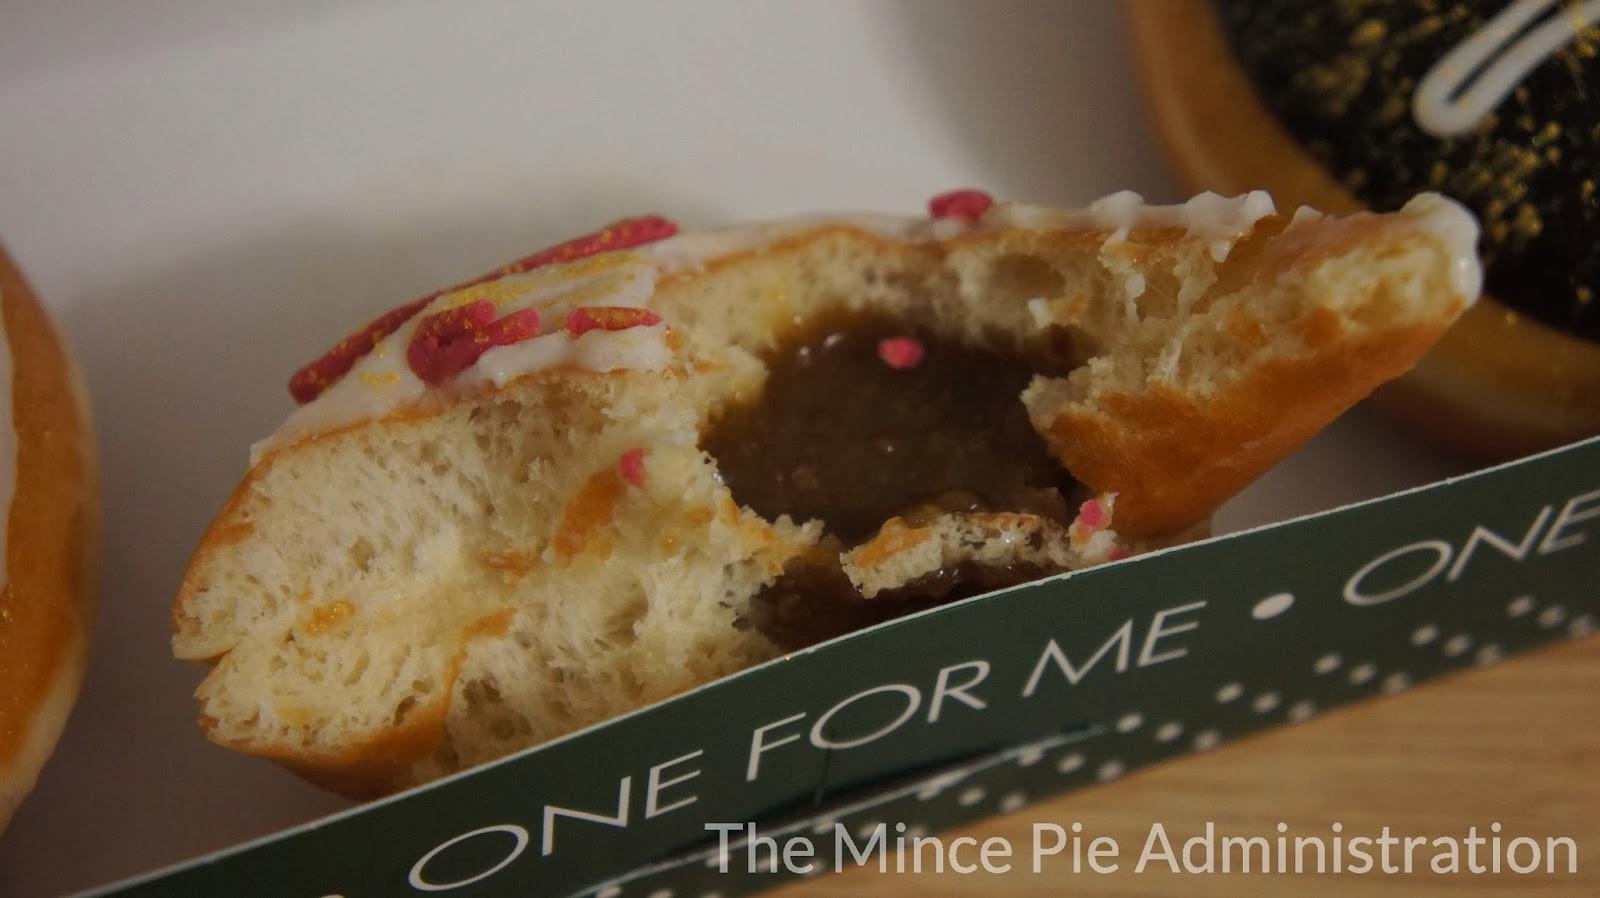 The Mince Pie Administration: Krispy Kreme - Mince Pie Doughnut